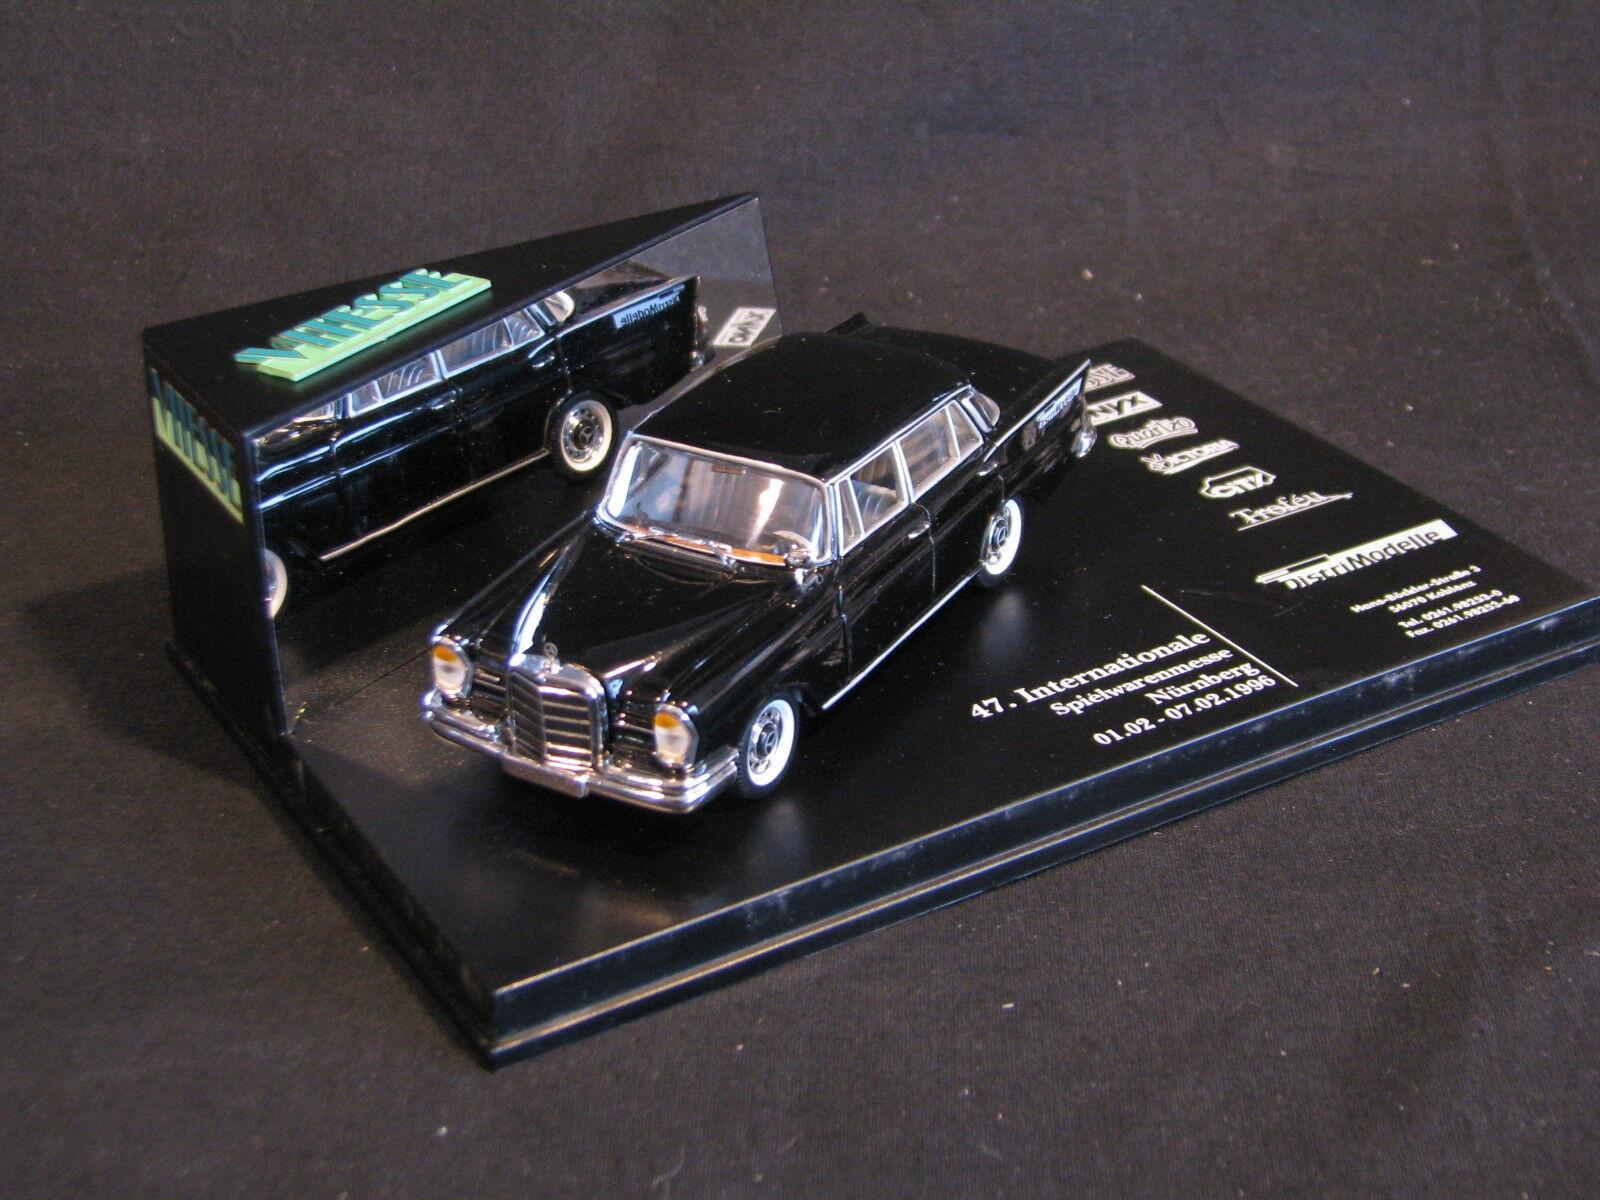 Vitesse Mercedes-Benz 220SE 1 43 47. Internationale Speilwaren Messe 1996 (JS)